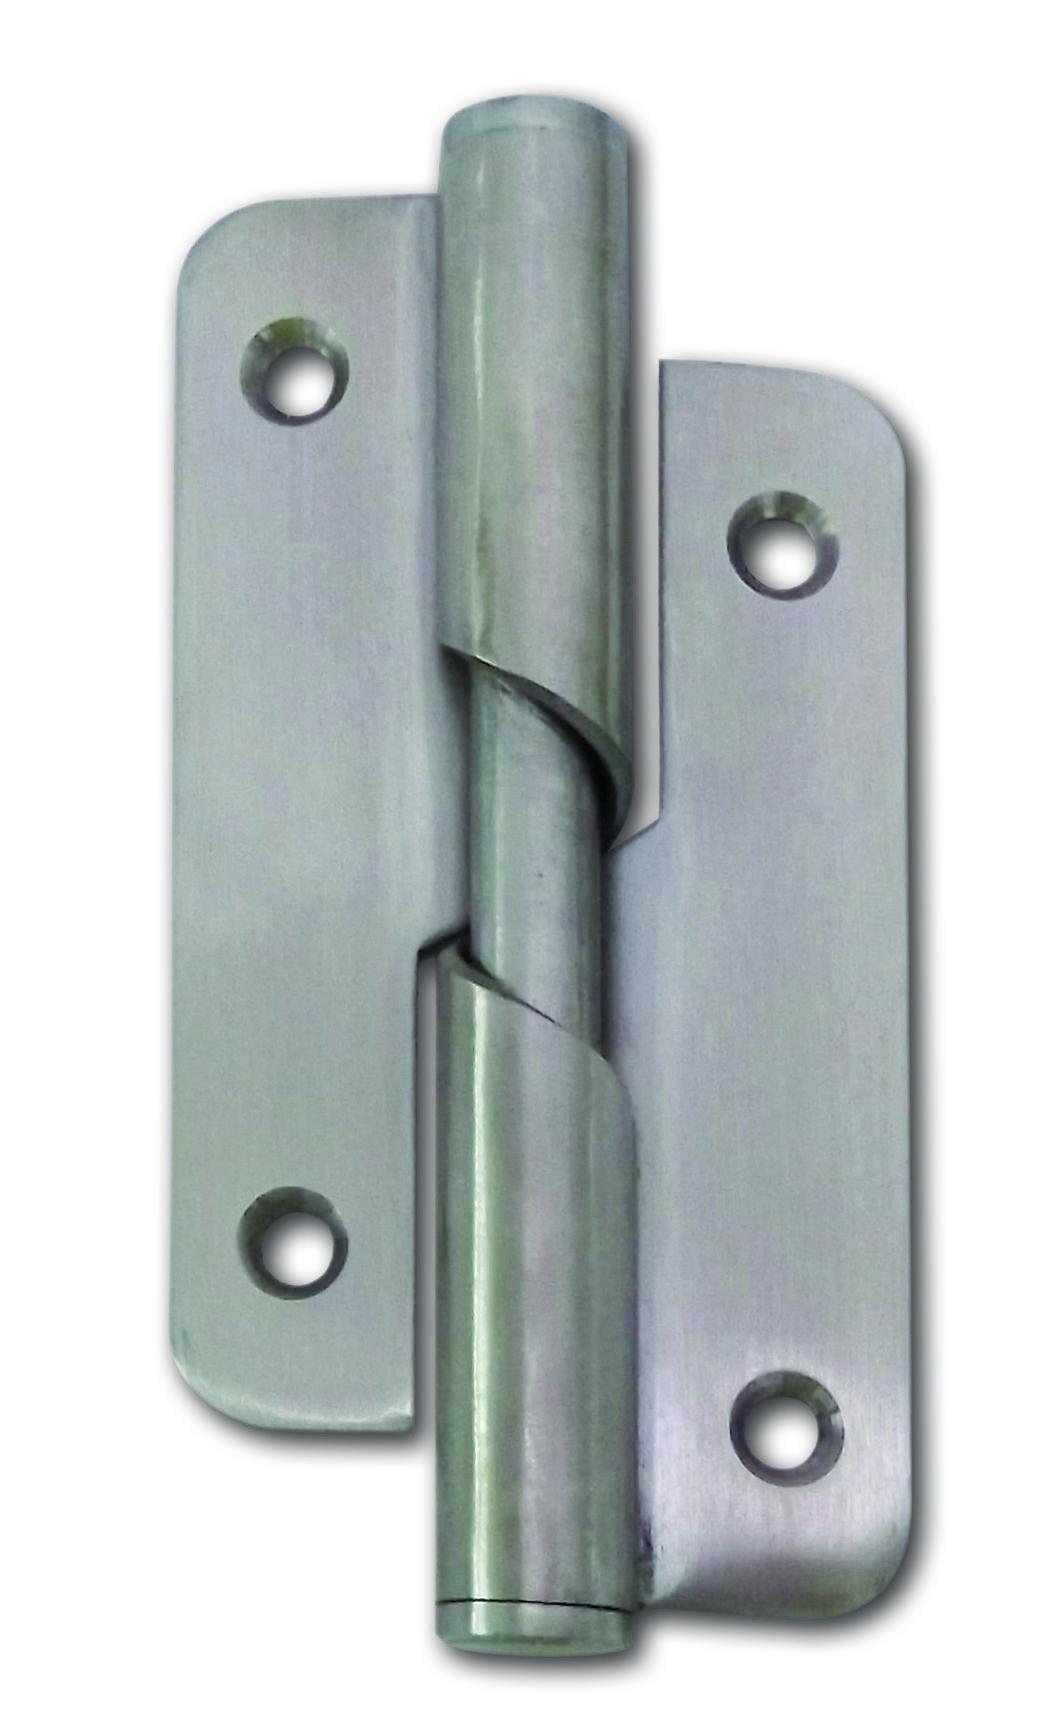 self closing hinge rising hinge made of stainless steel 304 satin polished for toilet. Black Bedroom Furniture Sets. Home Design Ideas